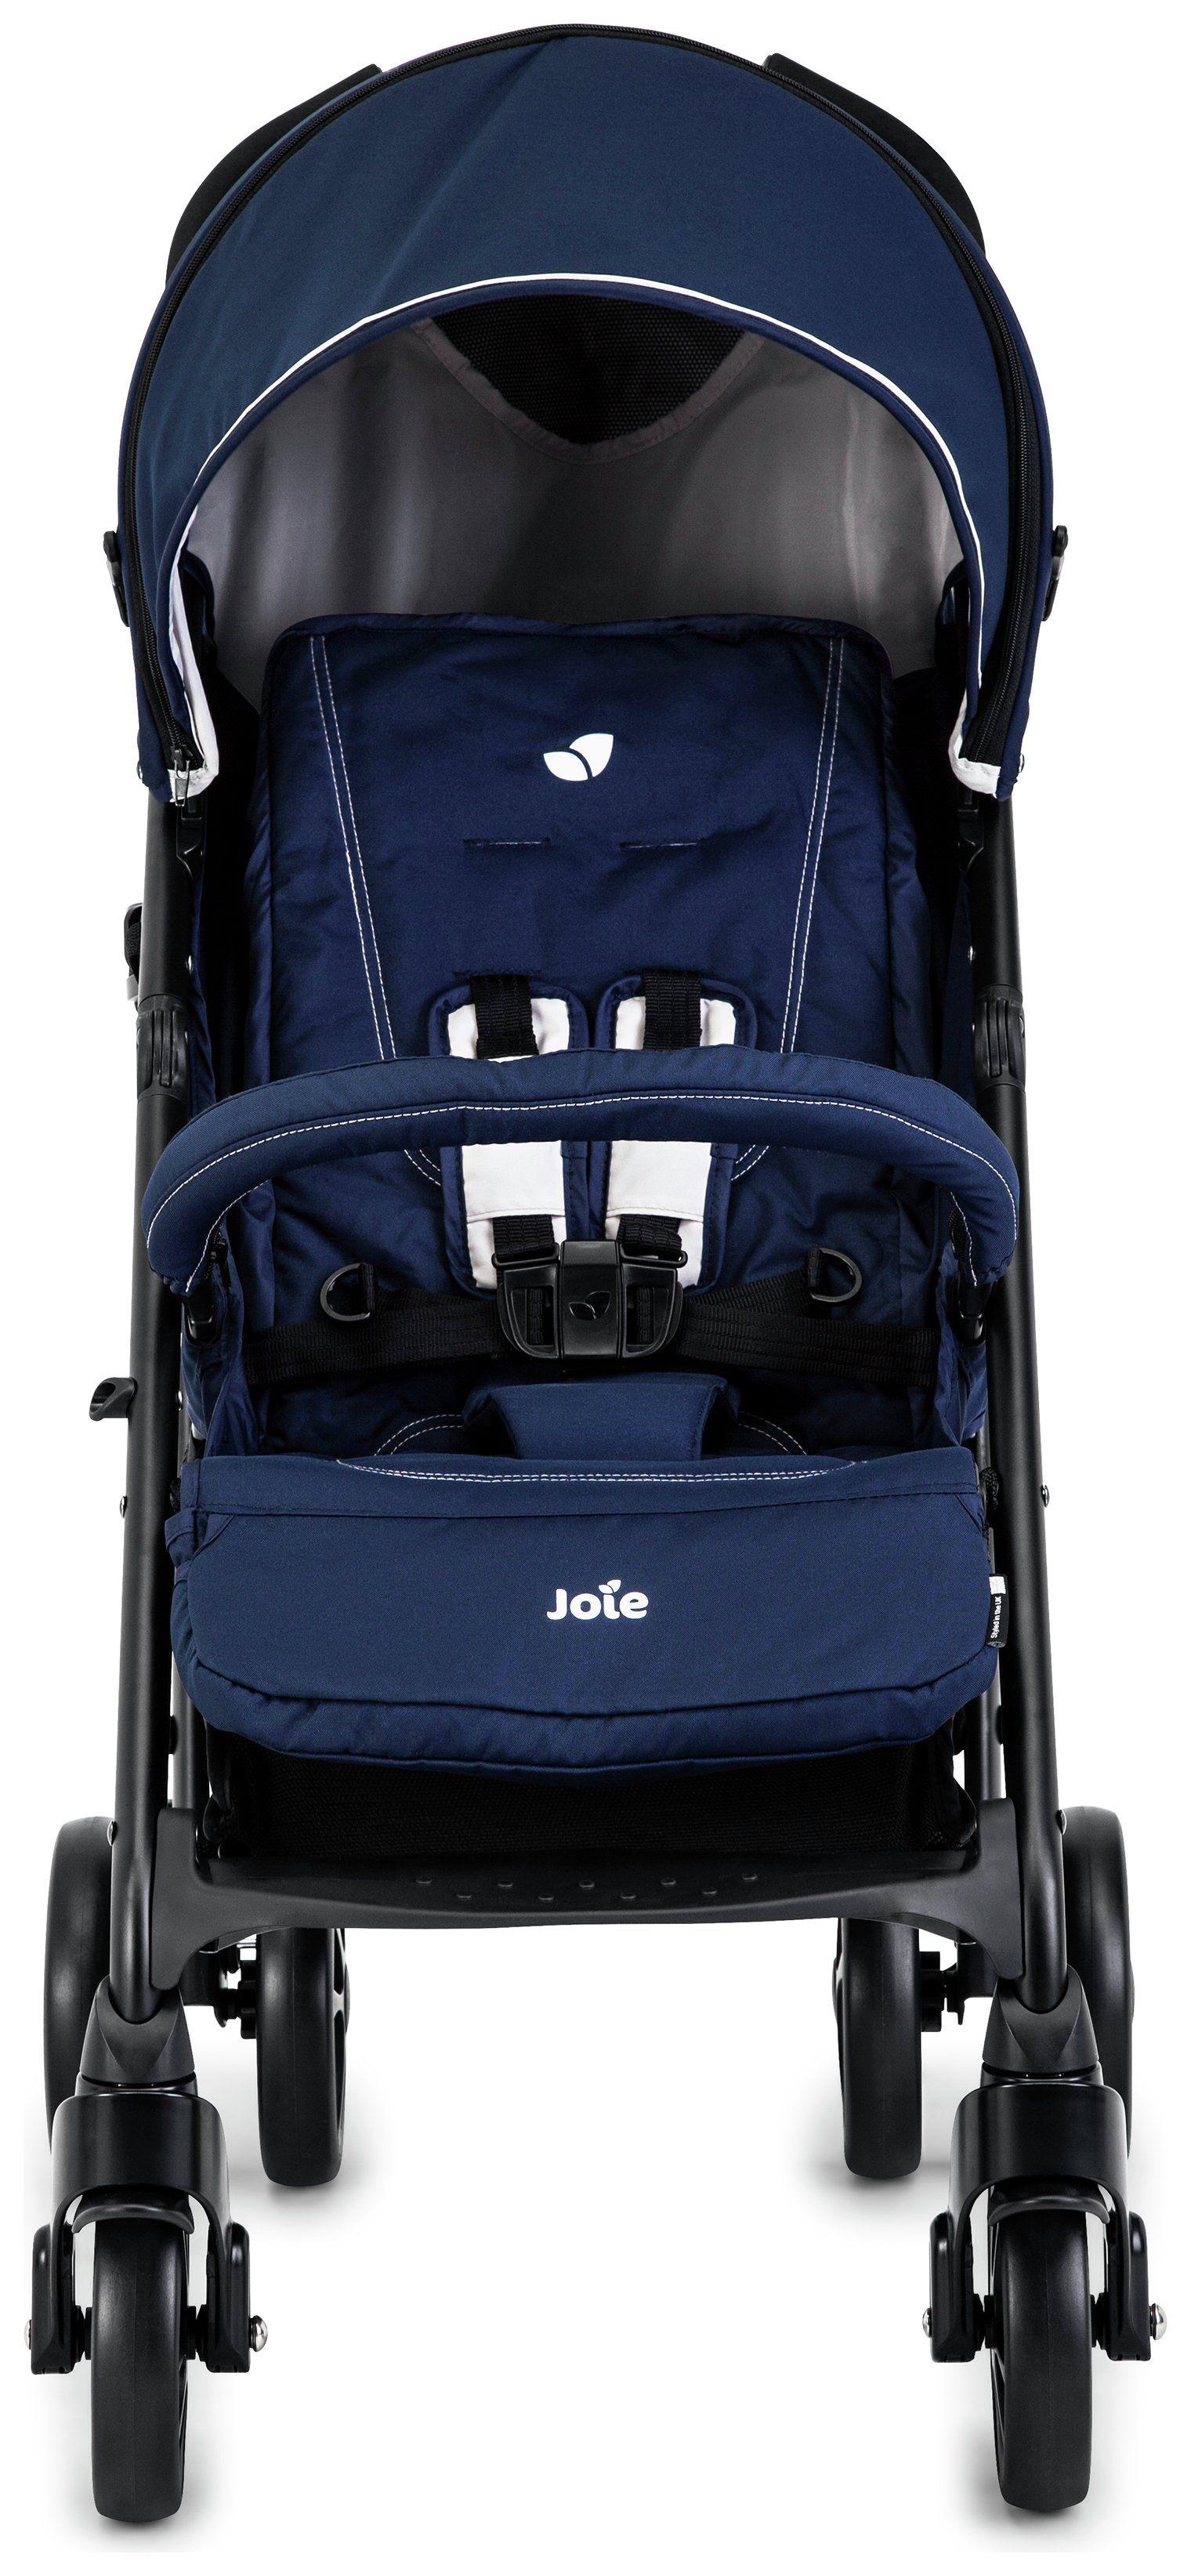 Joie Brisk Lx Stroller - Stroller